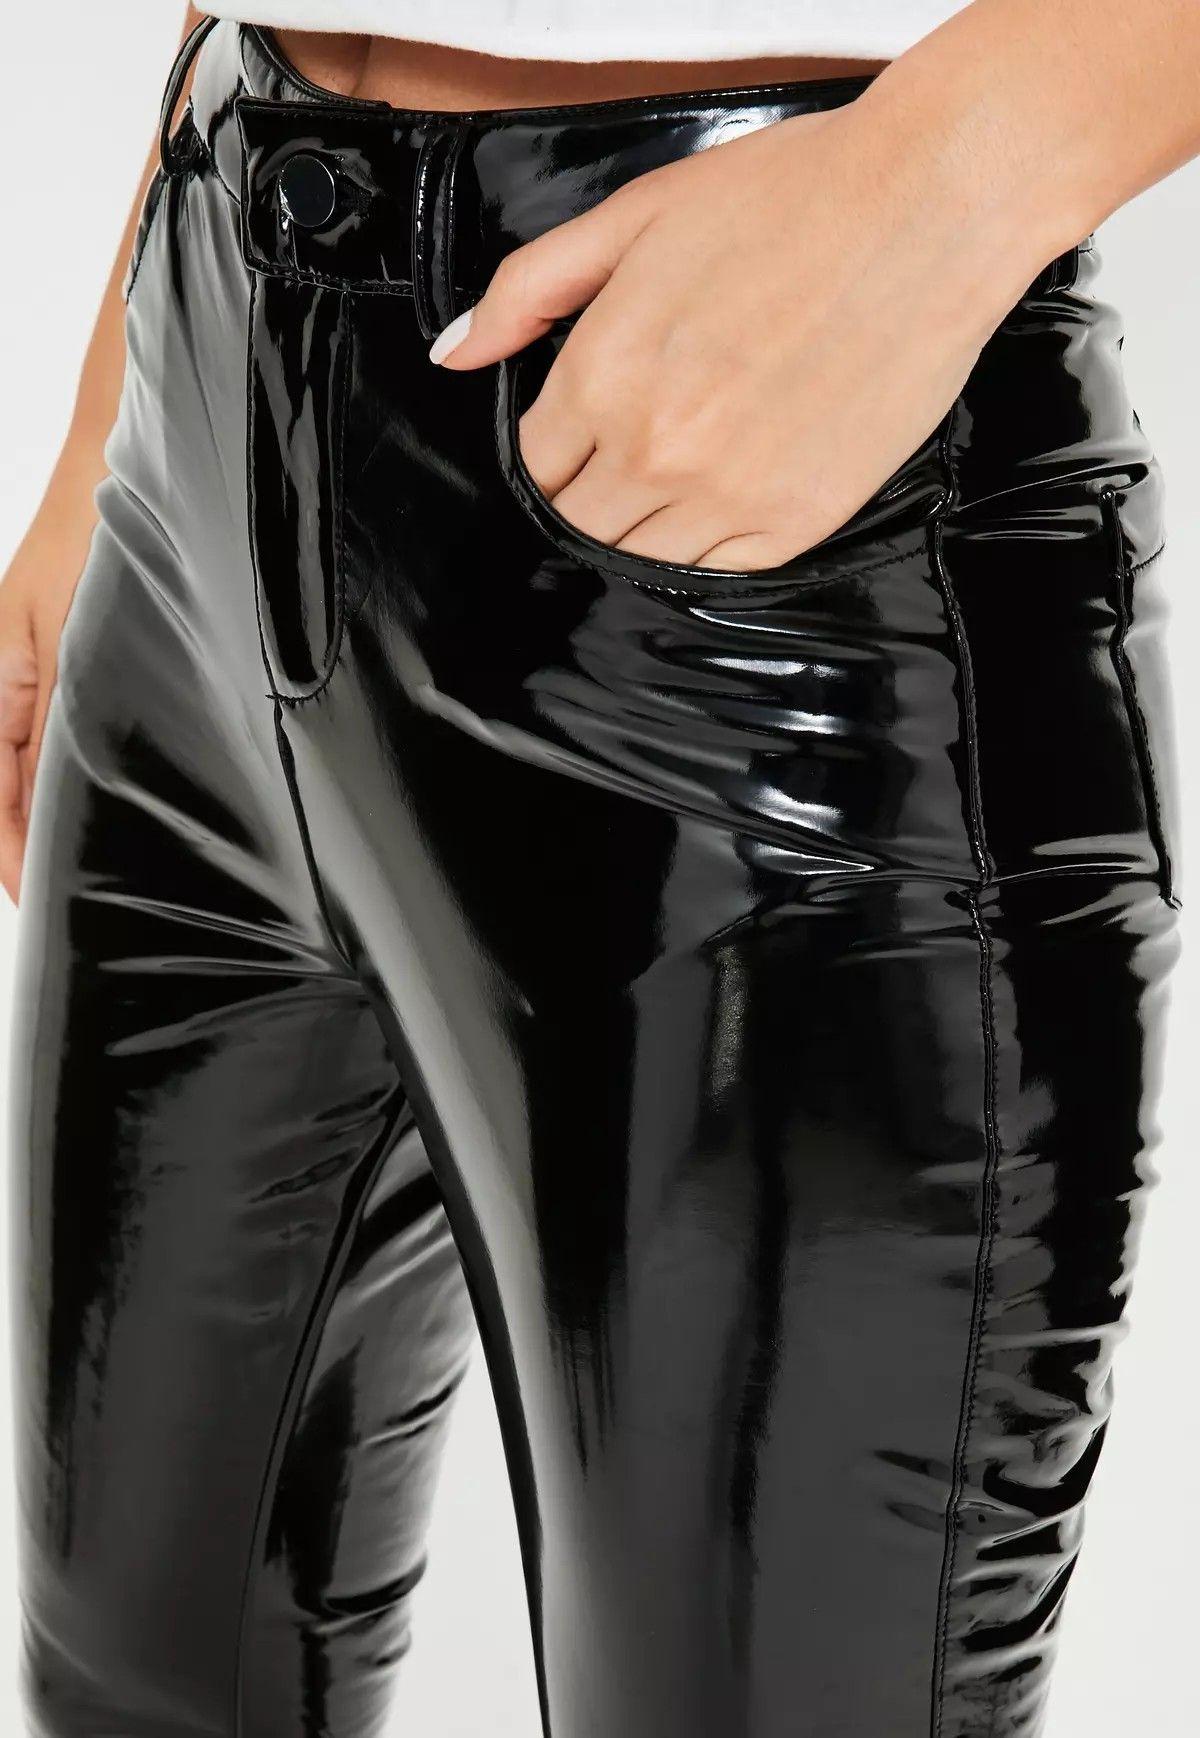 743e94a01d2 Pvc jeans. Pvc jeans Pvc Trousers